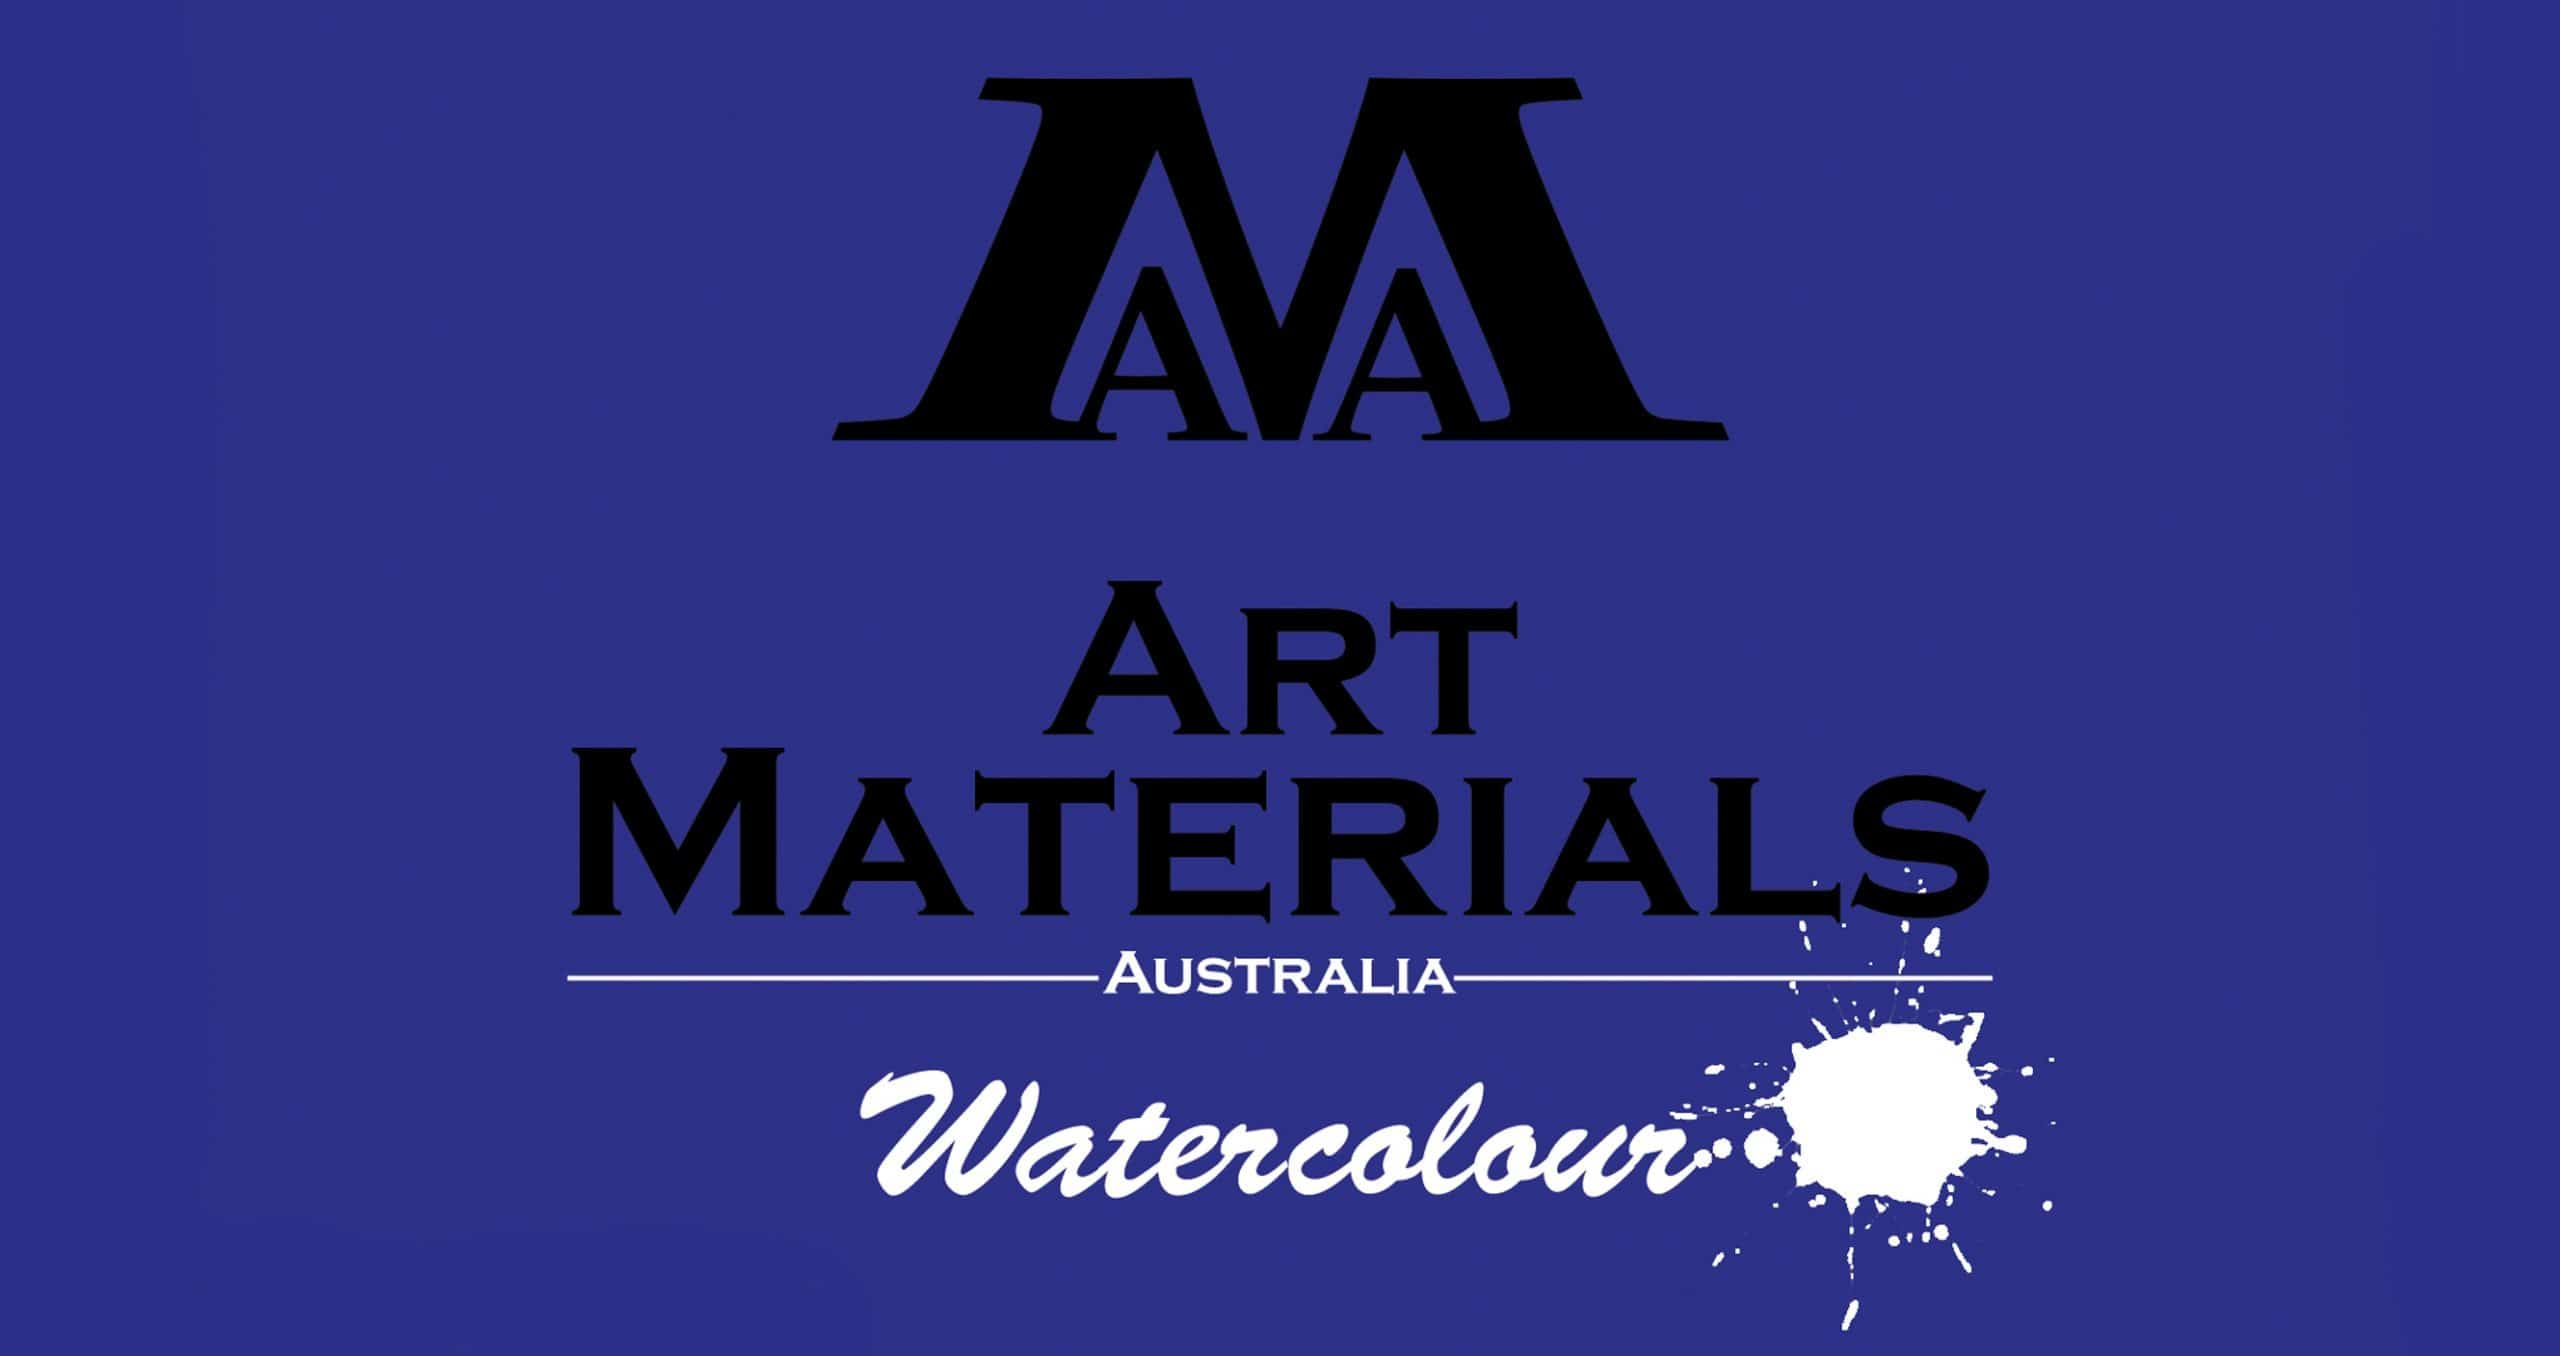 Watercolour canvases Art Materials Australia